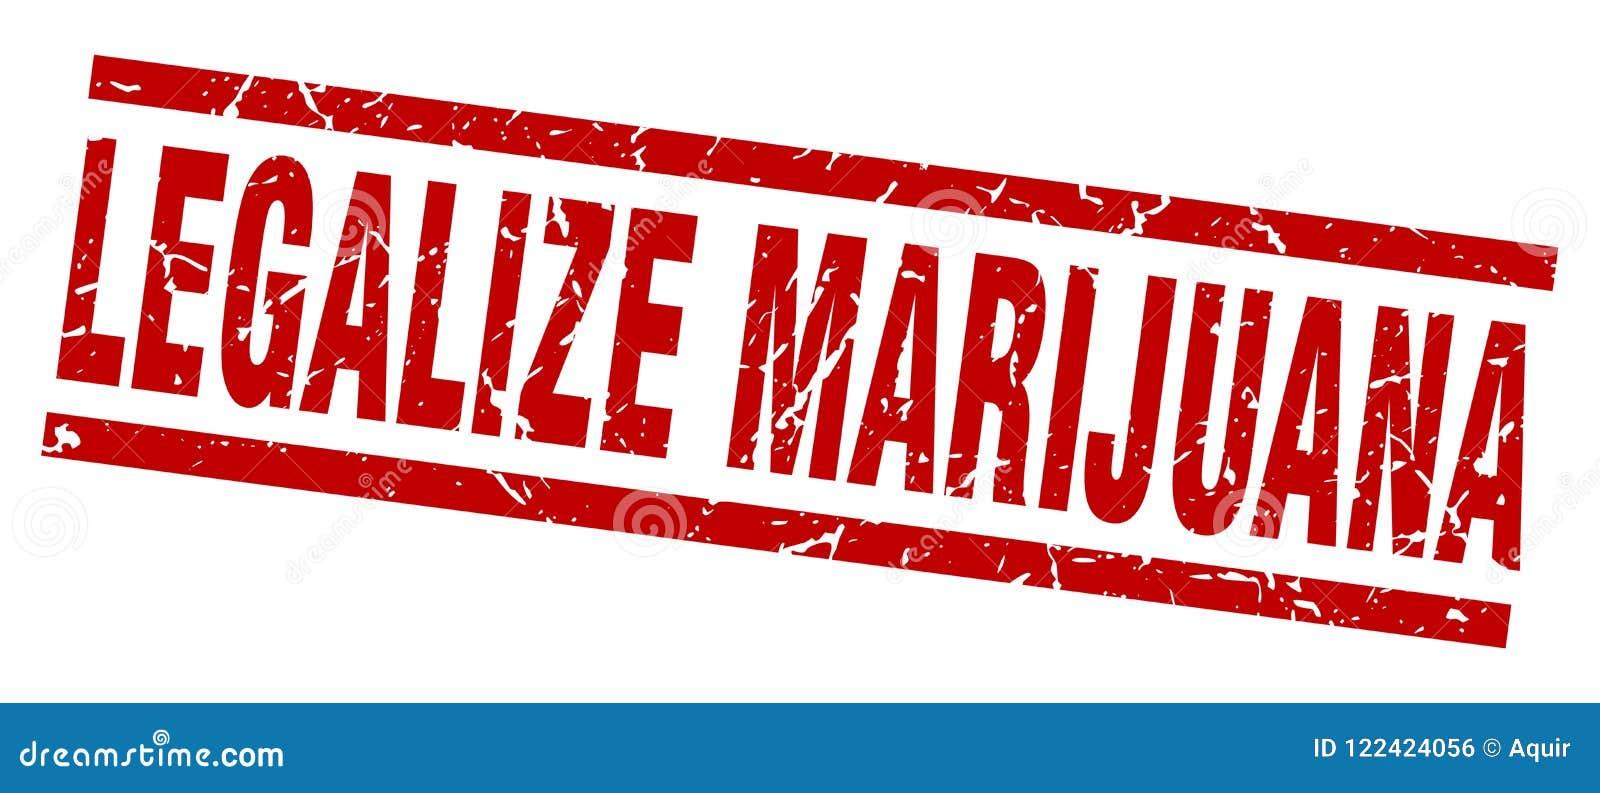 Legalice el sello de la marijuana